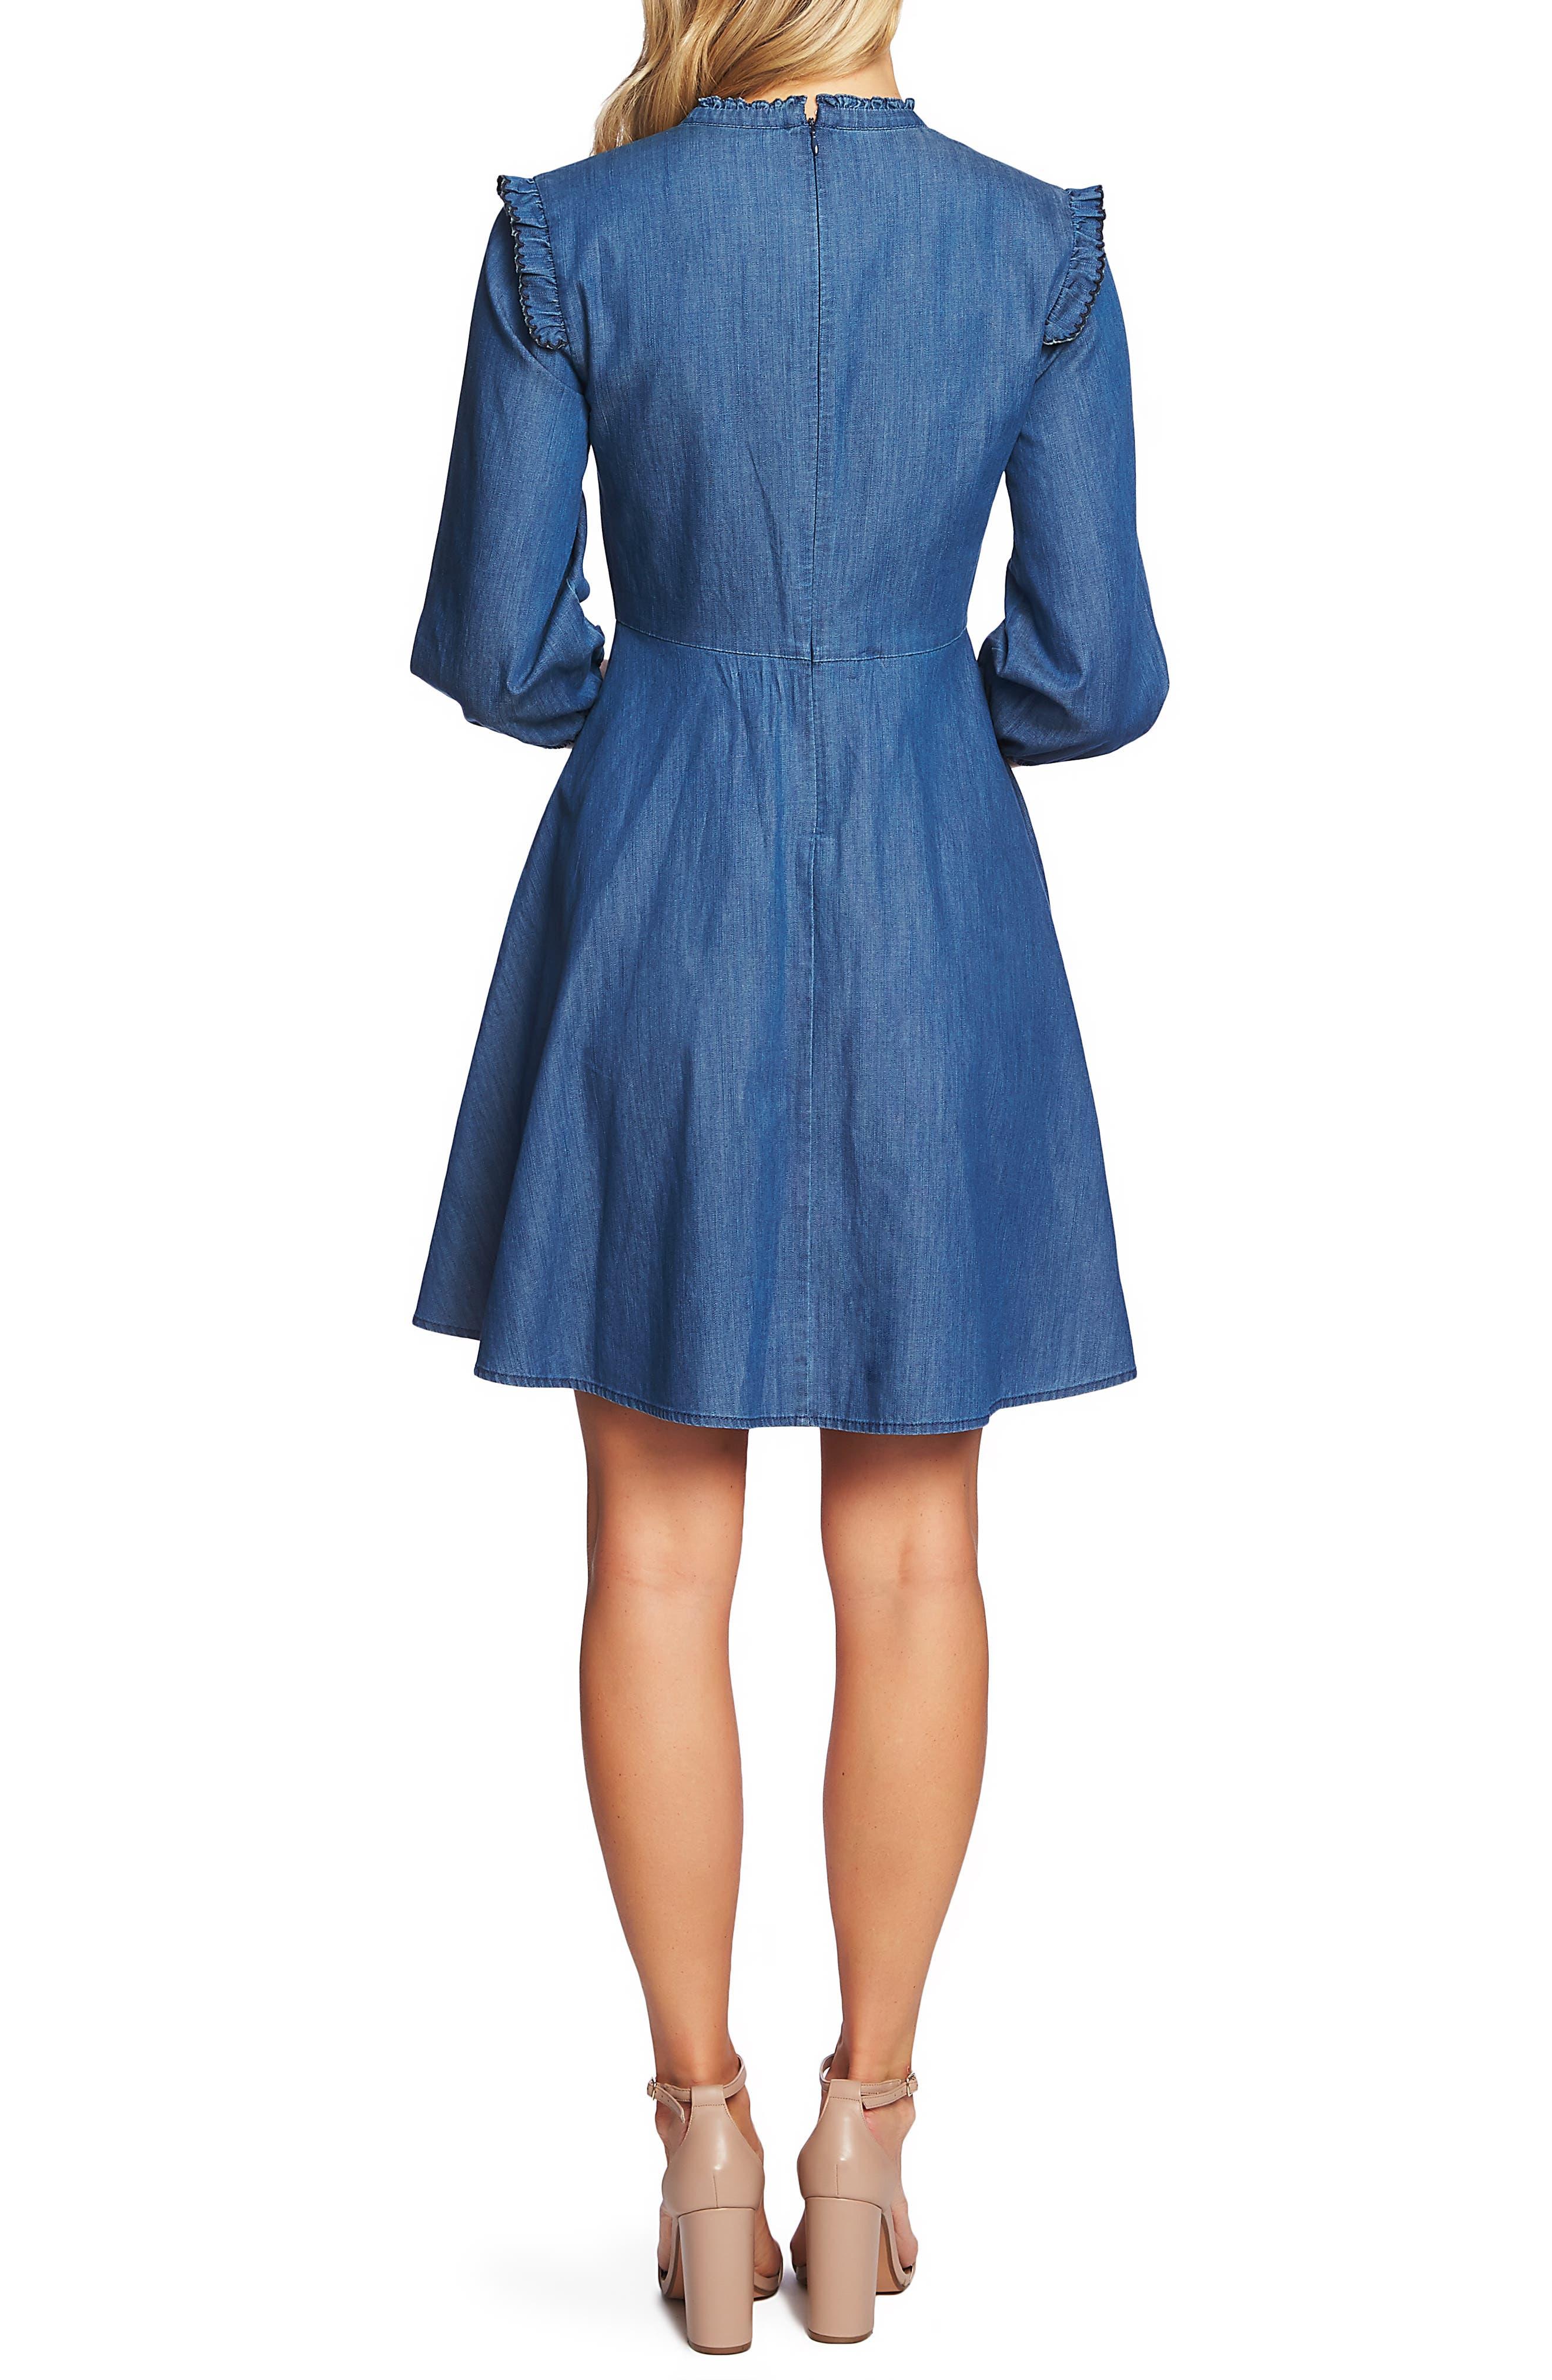 Pintuck Ruffle Denim Dress,                             Alternate thumbnail 2, color,                             AUTHENTIC